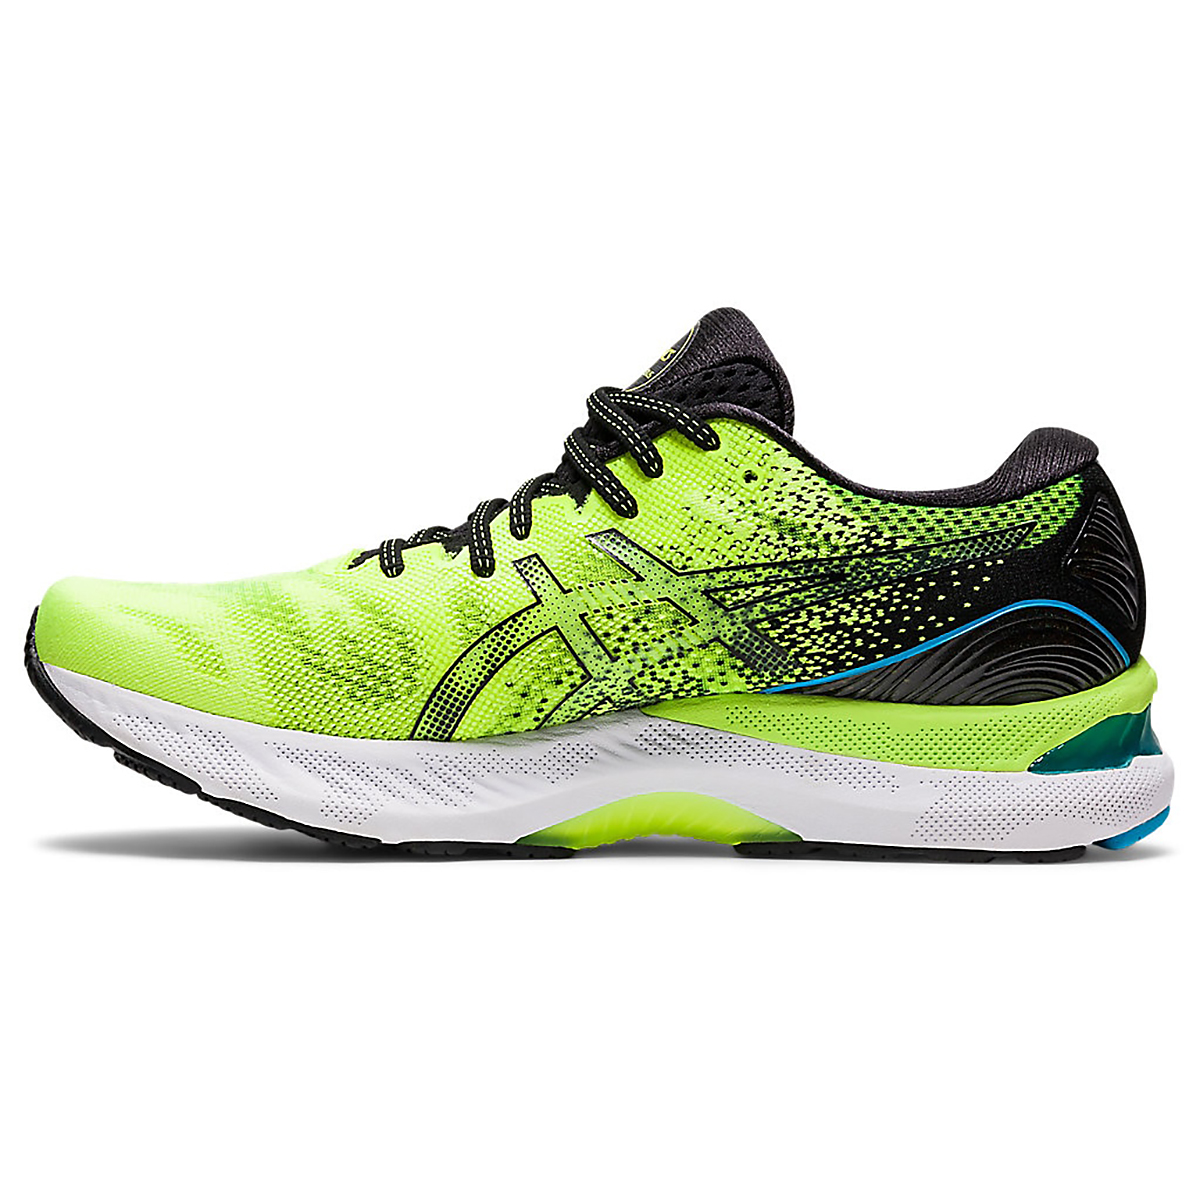 Men's Asics Gel-Nimbus 23 Running Shoe - Color: Hazard Green/Black - Size: 7 - Width: Regular, Hazard Green/Black, large, image 2